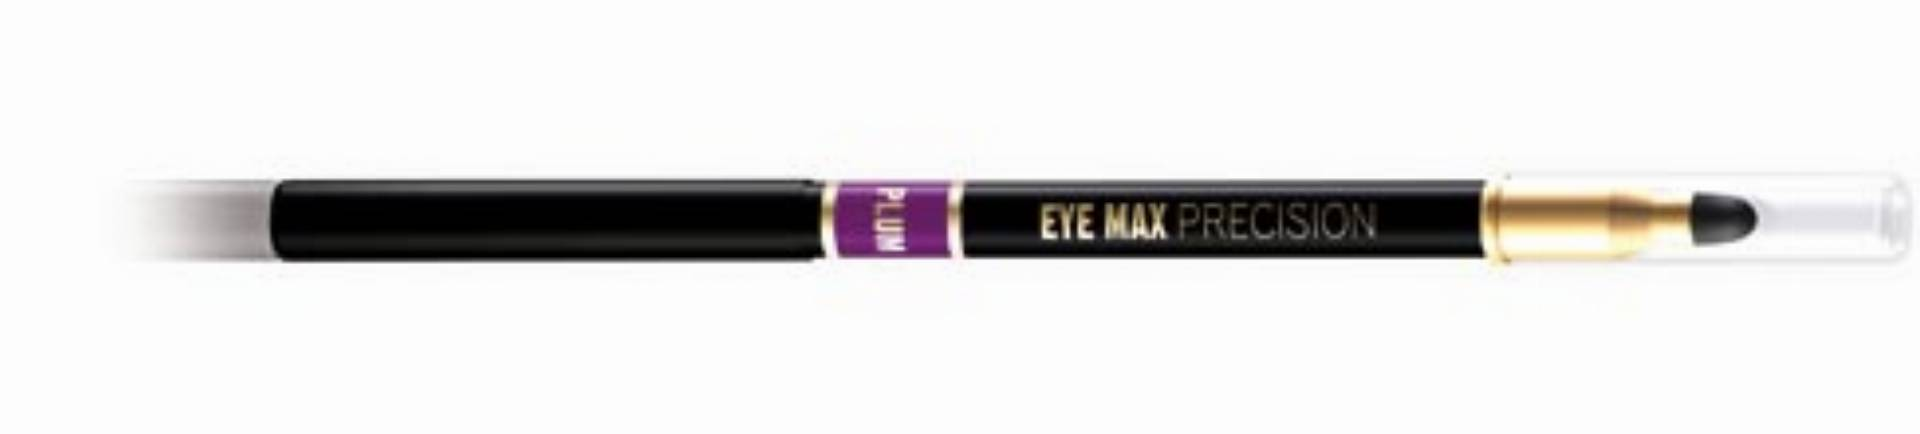 Eveline Cosmetics - kredka Eye Max Precision